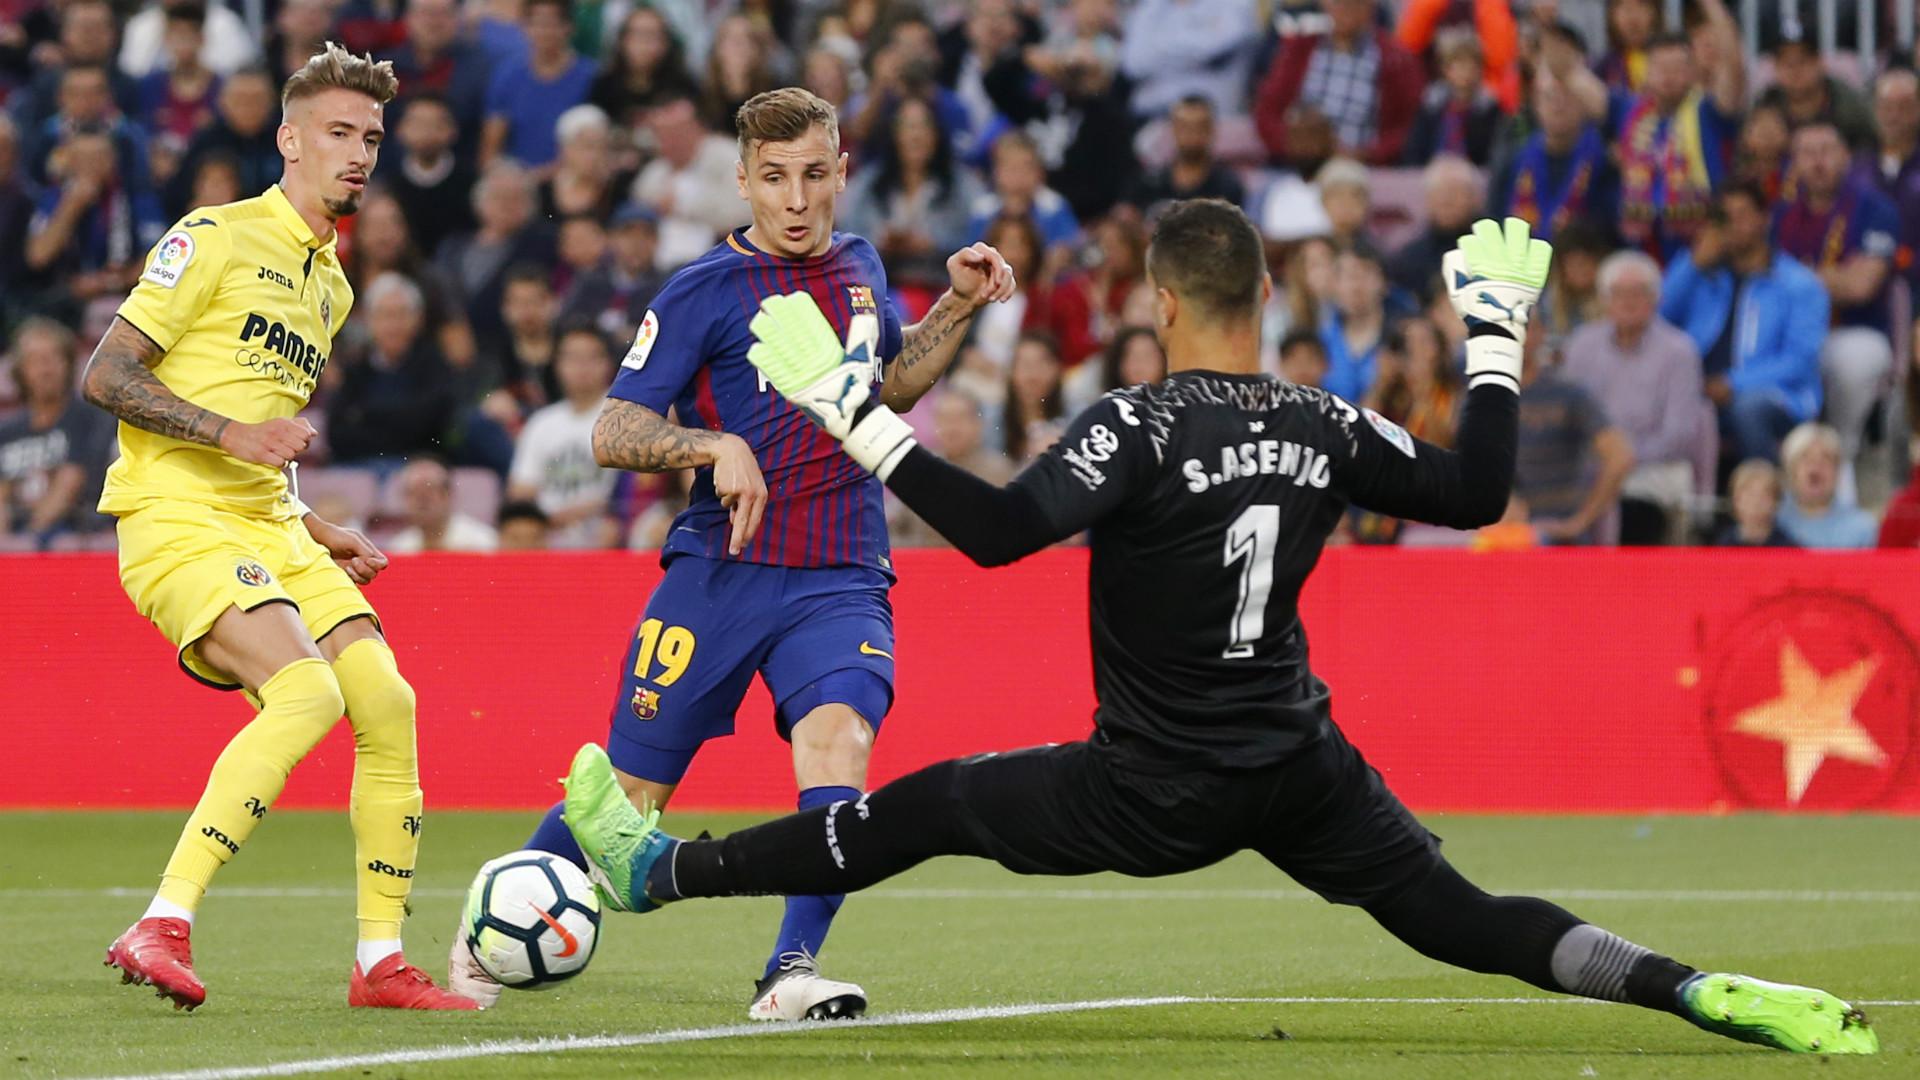 Lucas Digne Sergio Asensio - Barcelona Villarreal - 2017-18